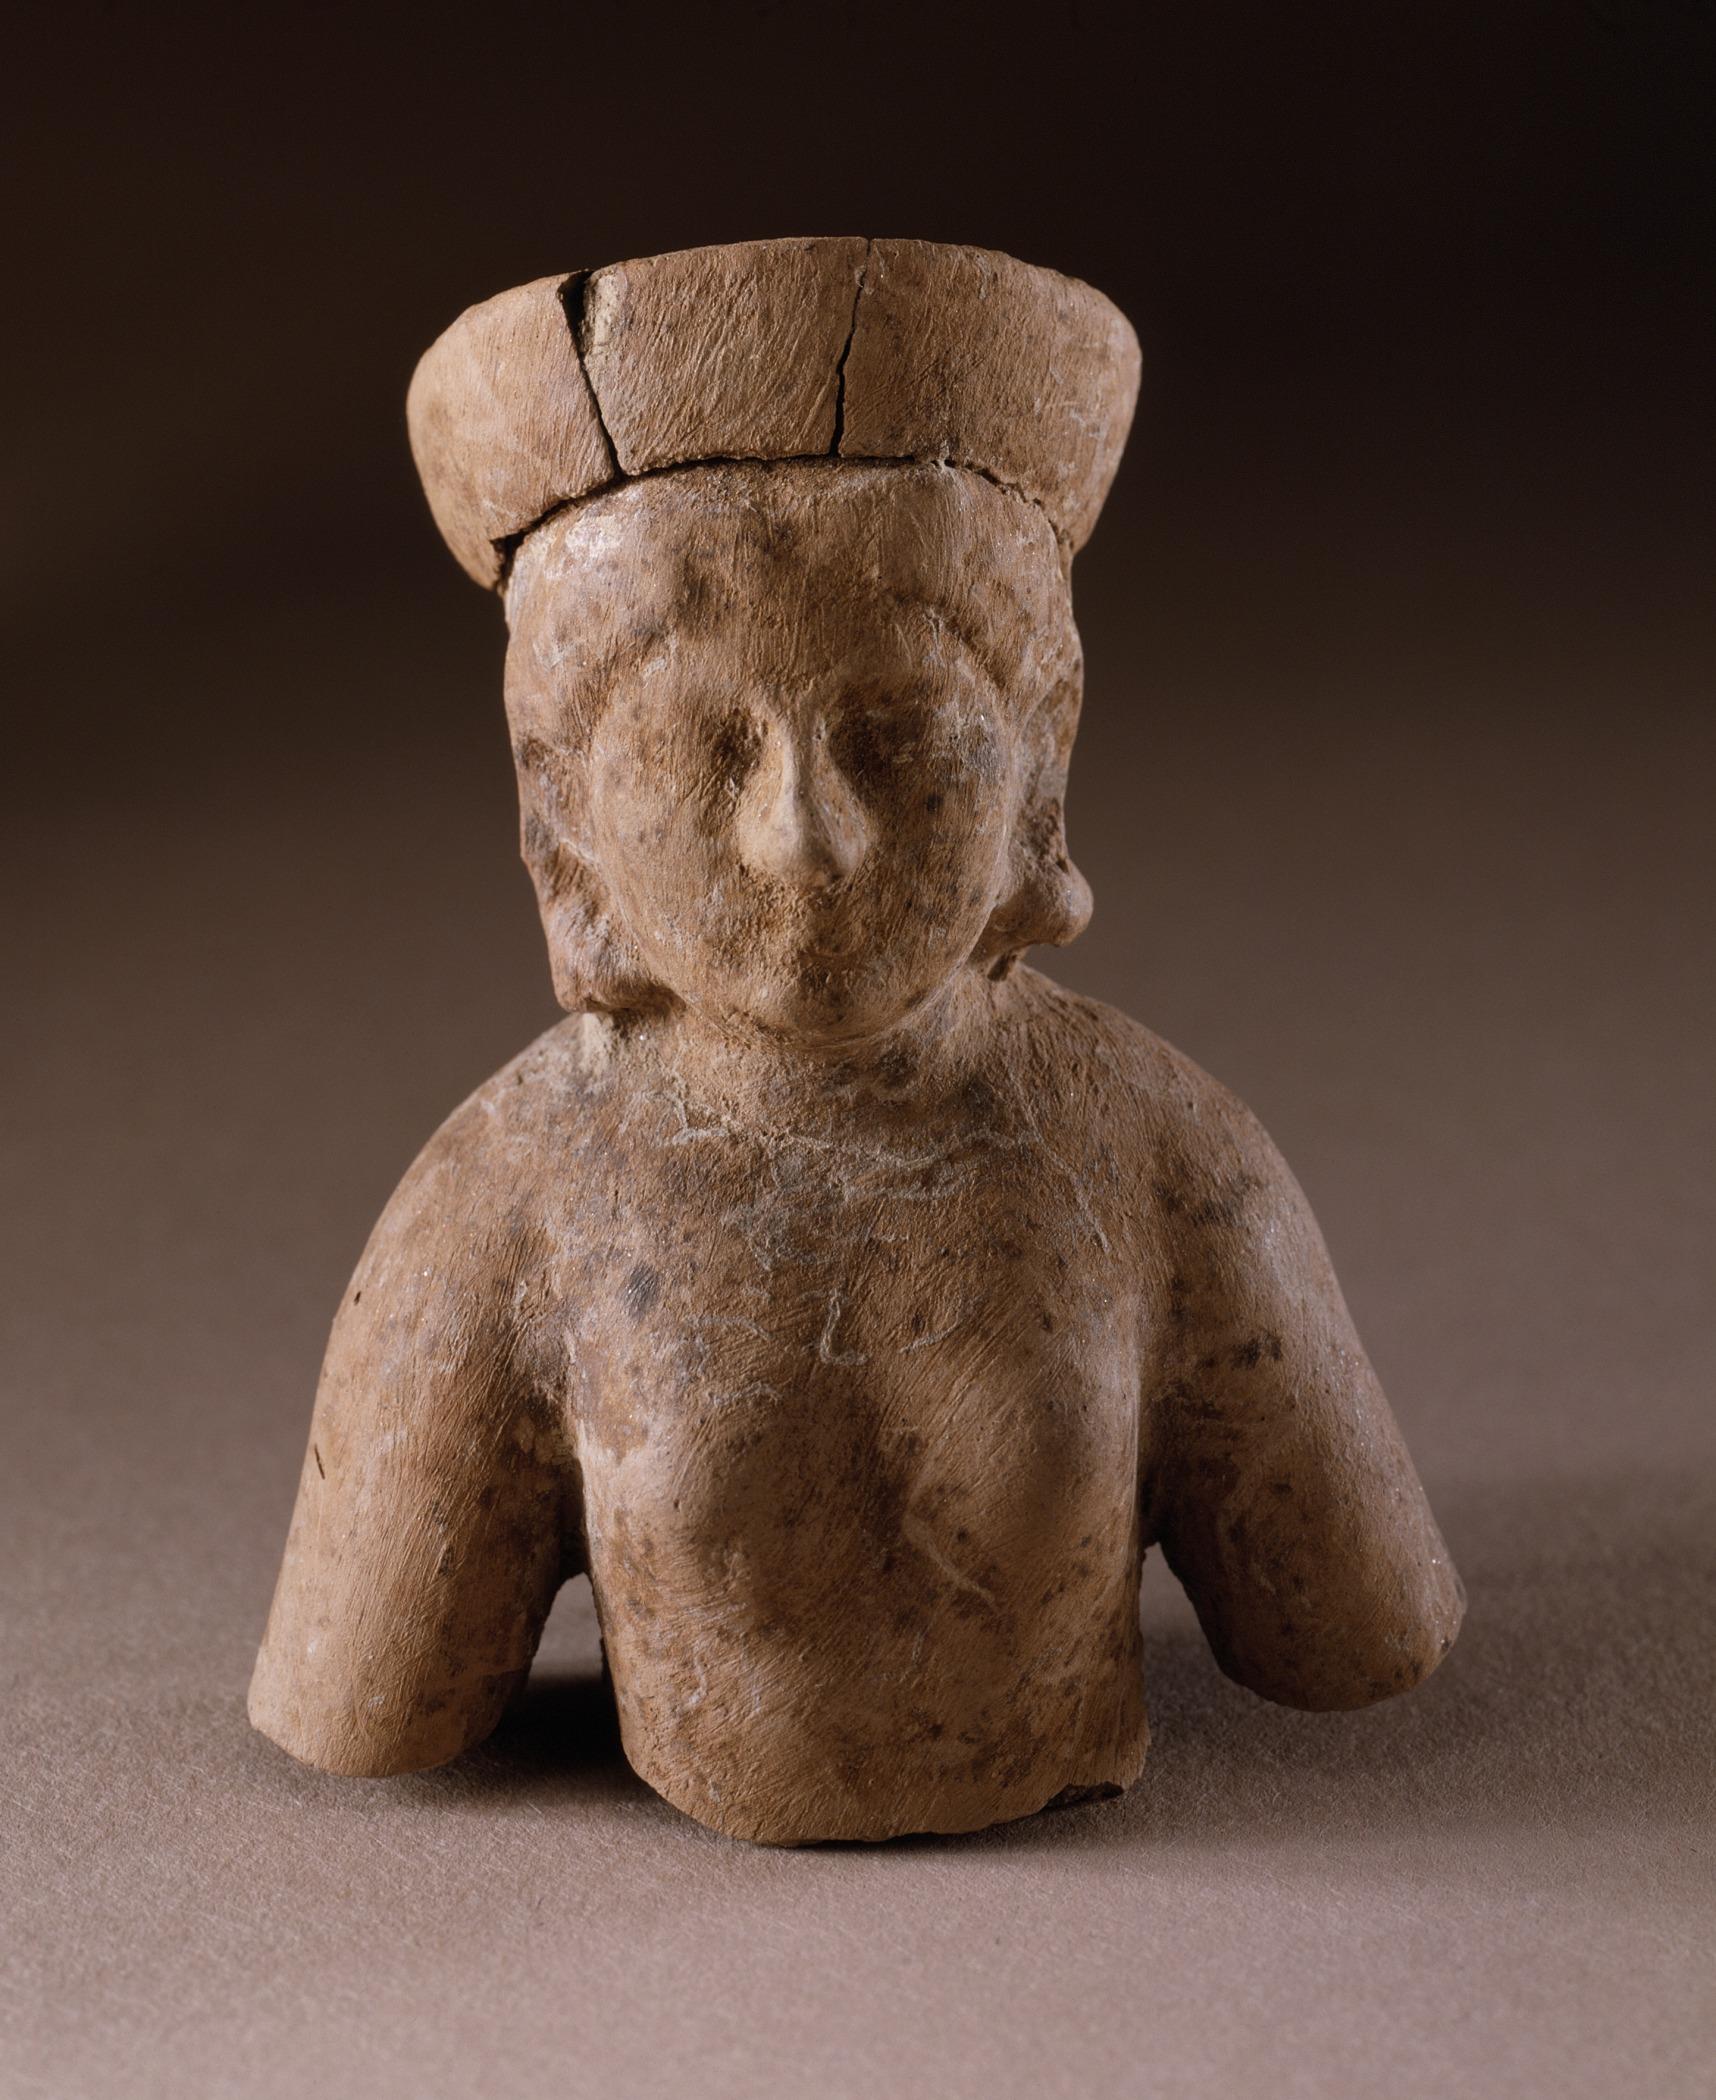 File:Fertility Goddess LACMA M 89 130 4 (1 of 2) jpg